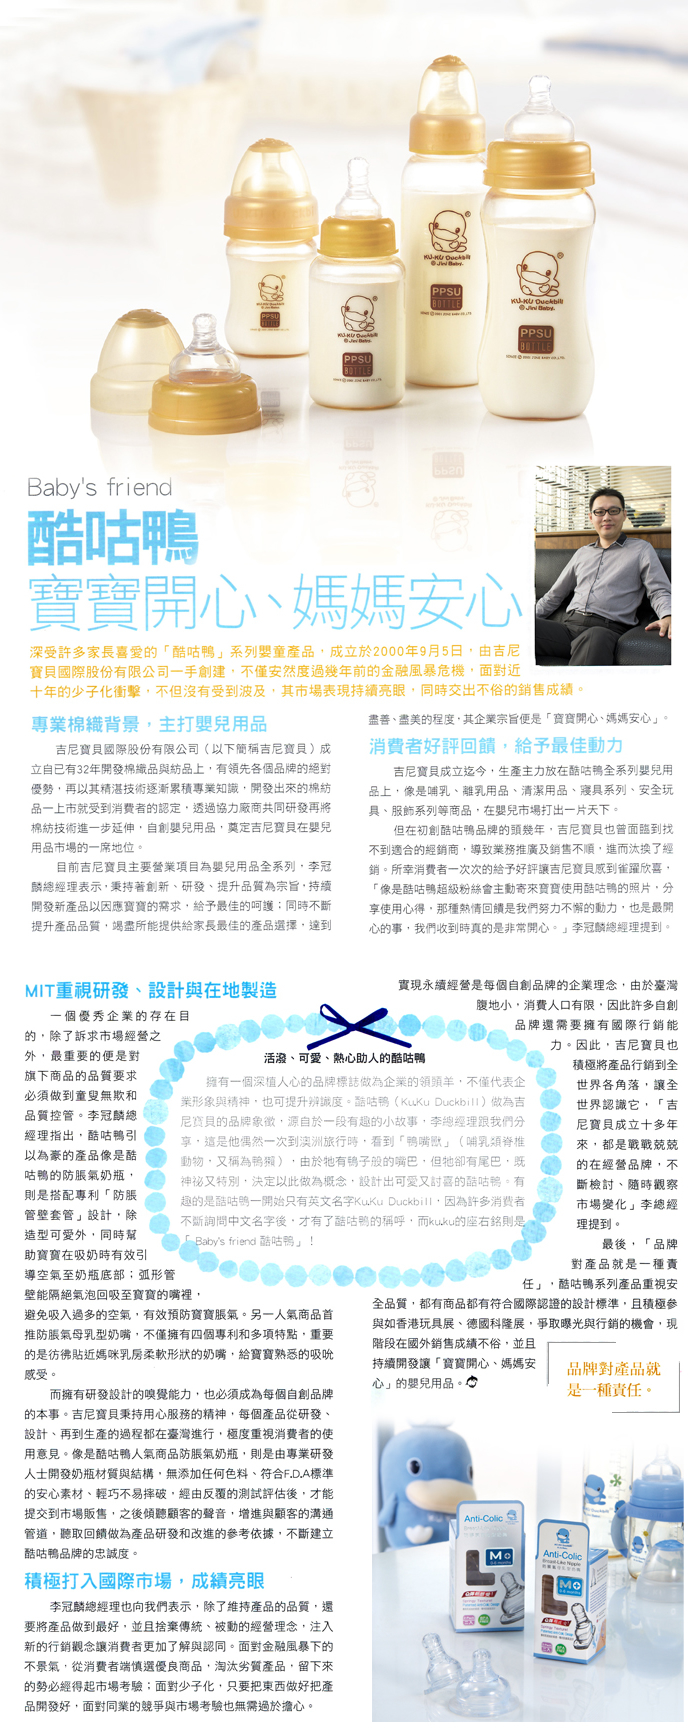 proimages/company/news-01-a.jpg